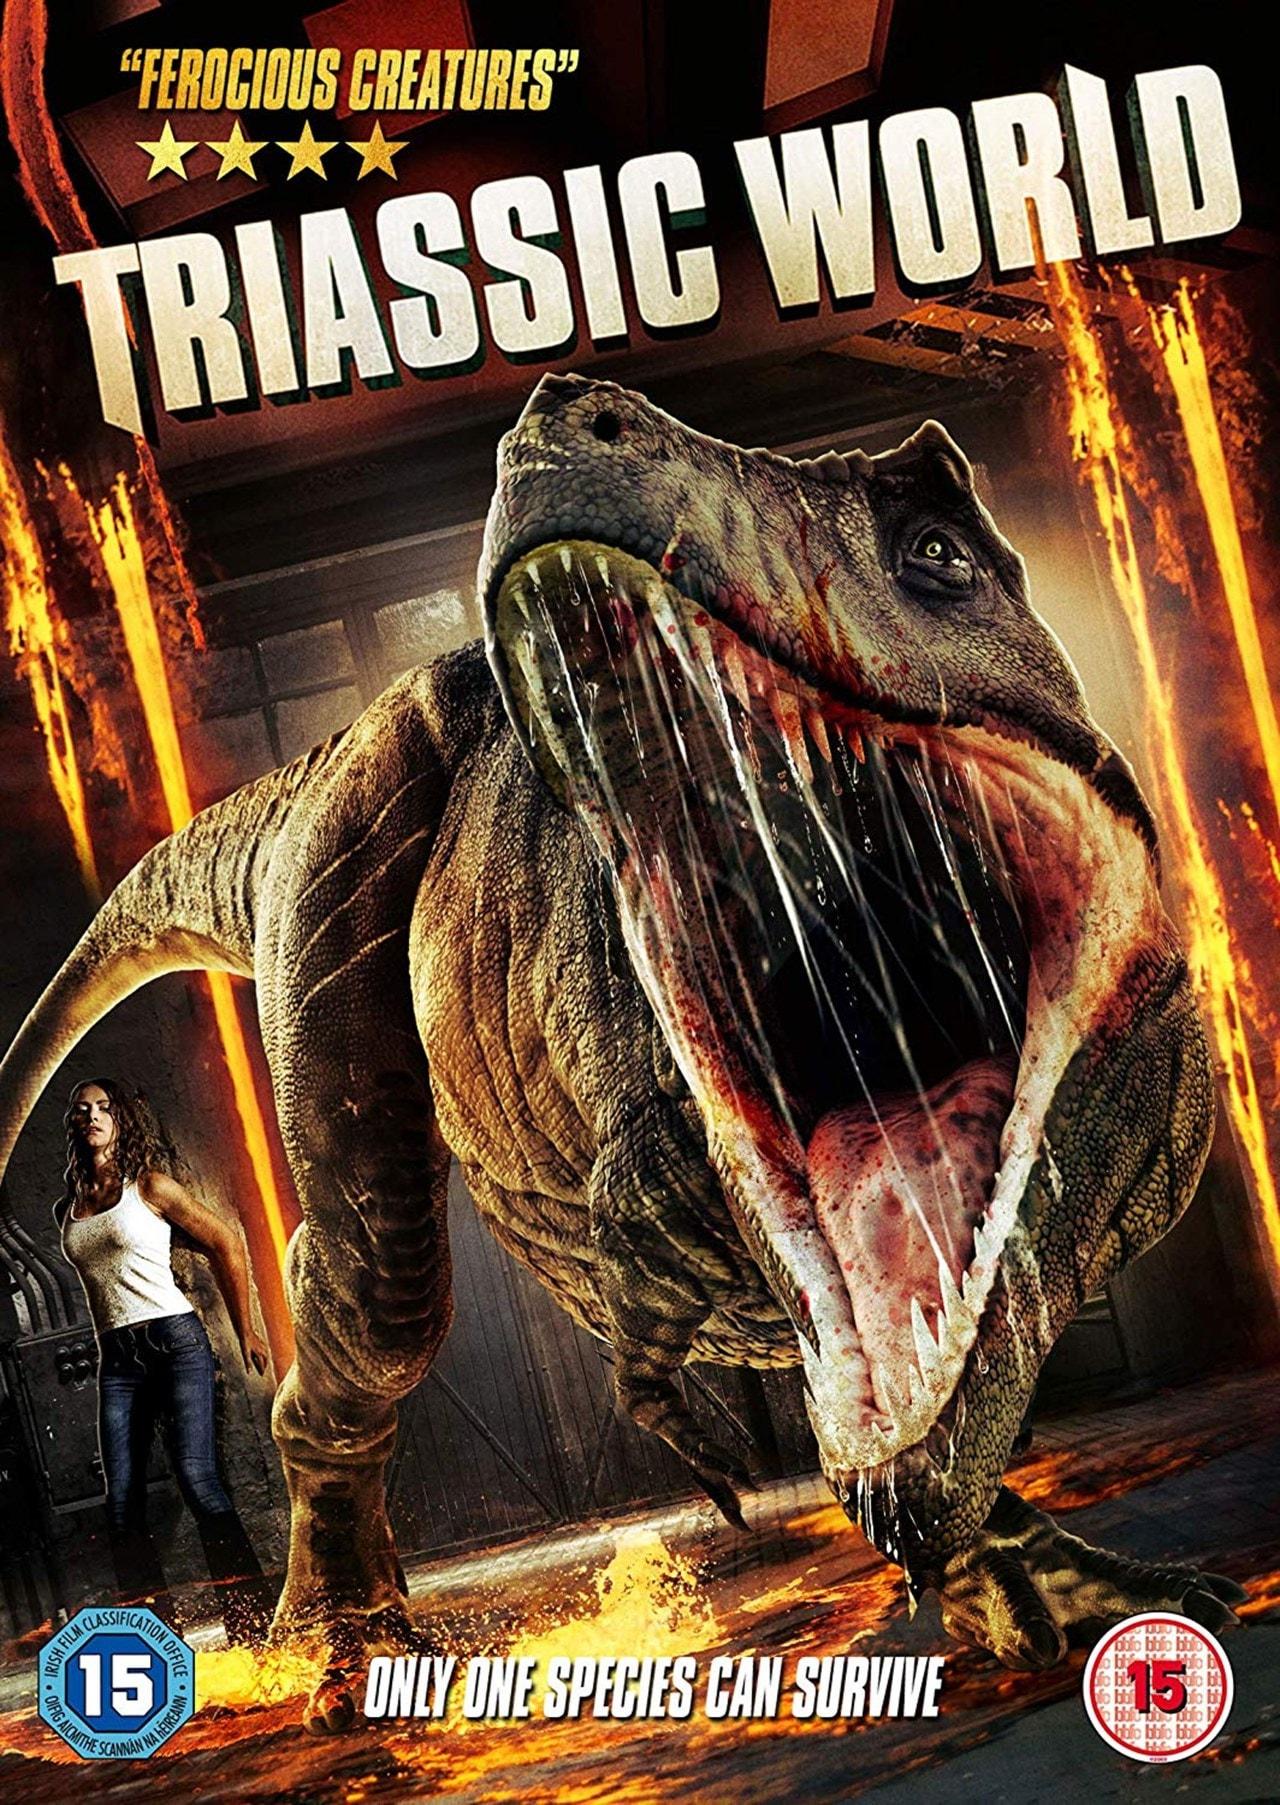 Triassic World - 1